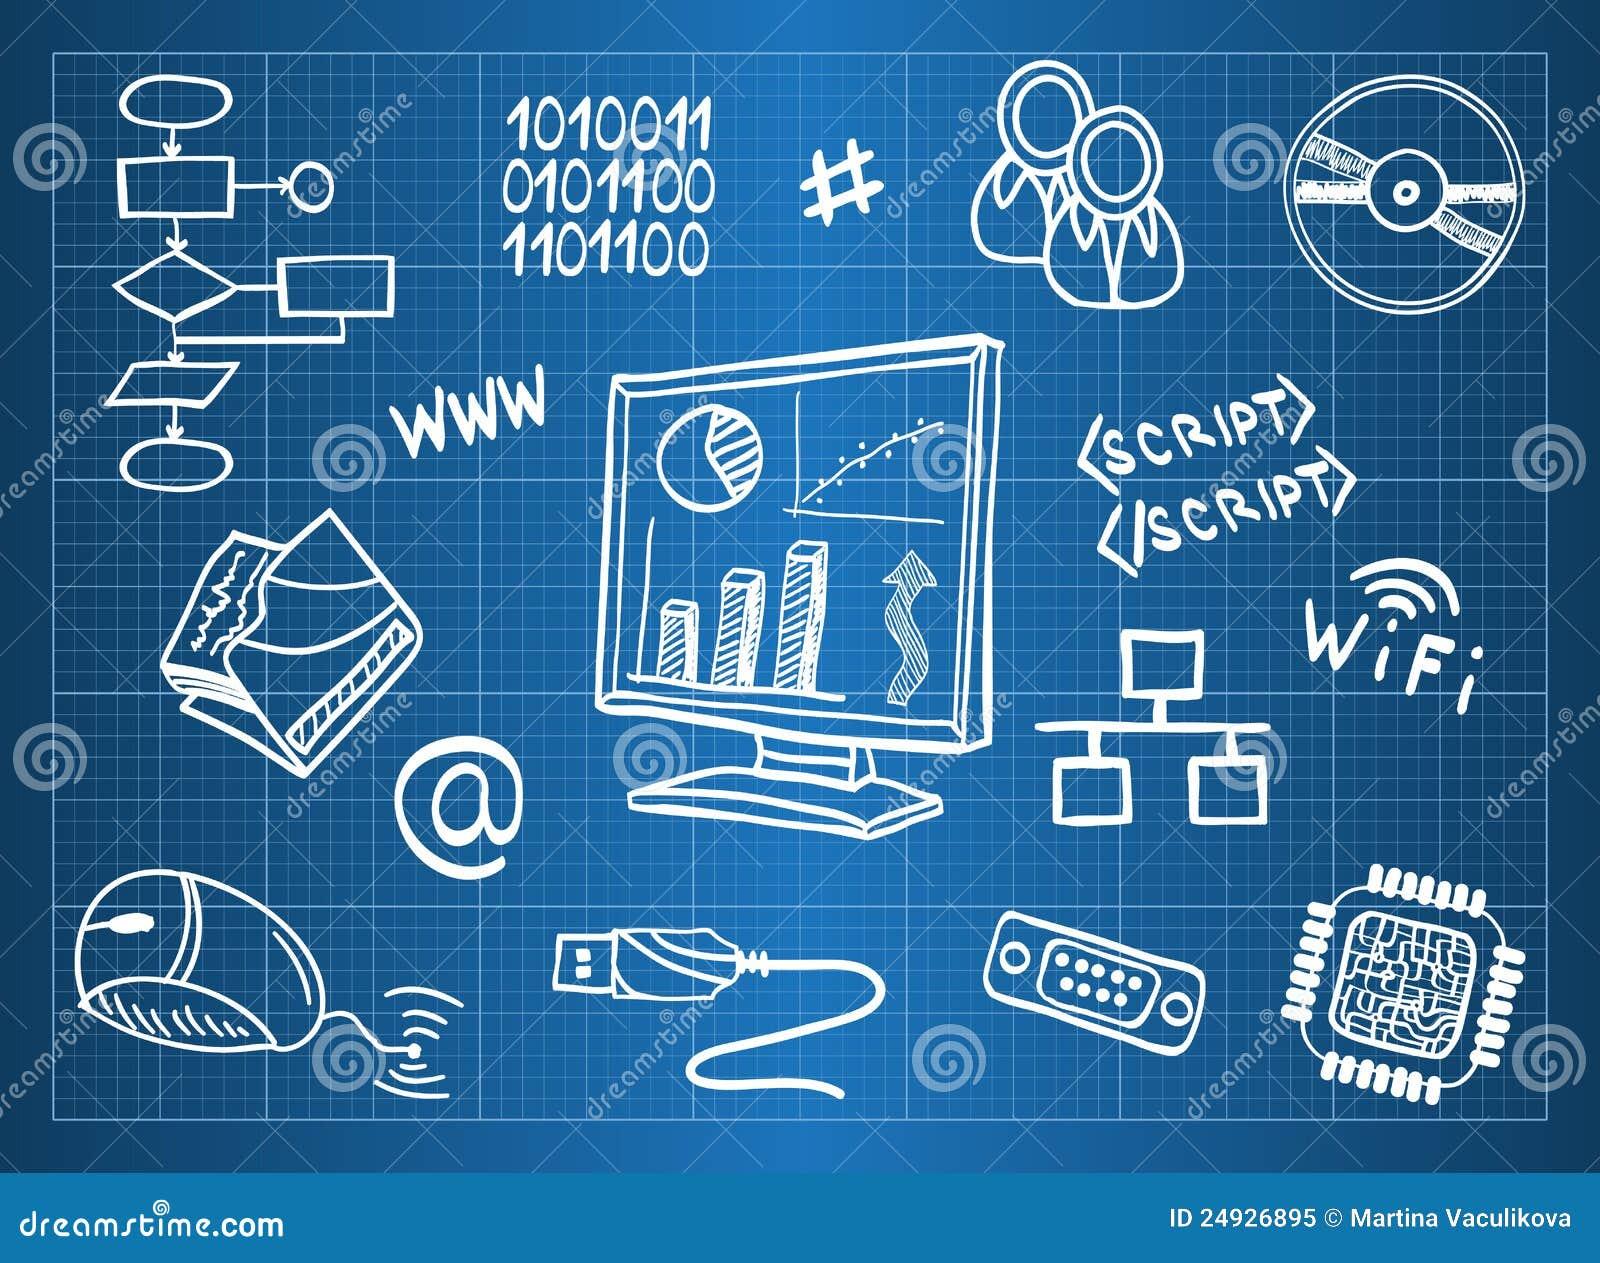 Computer hardware and IT symbols